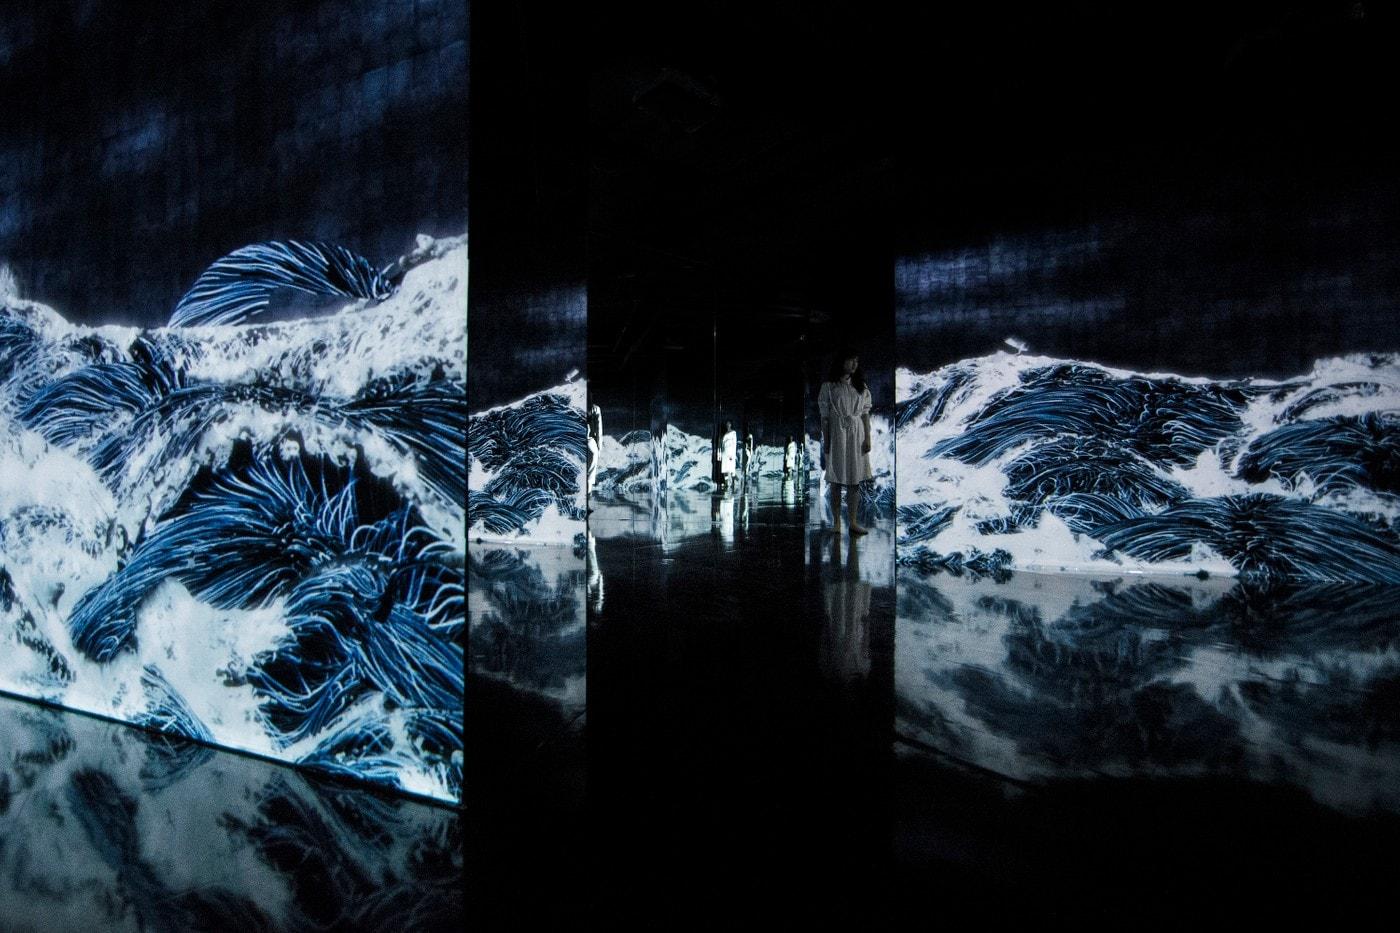 HYPEBEAST 精選回顧 2019 上半年度潮流藝術展覽